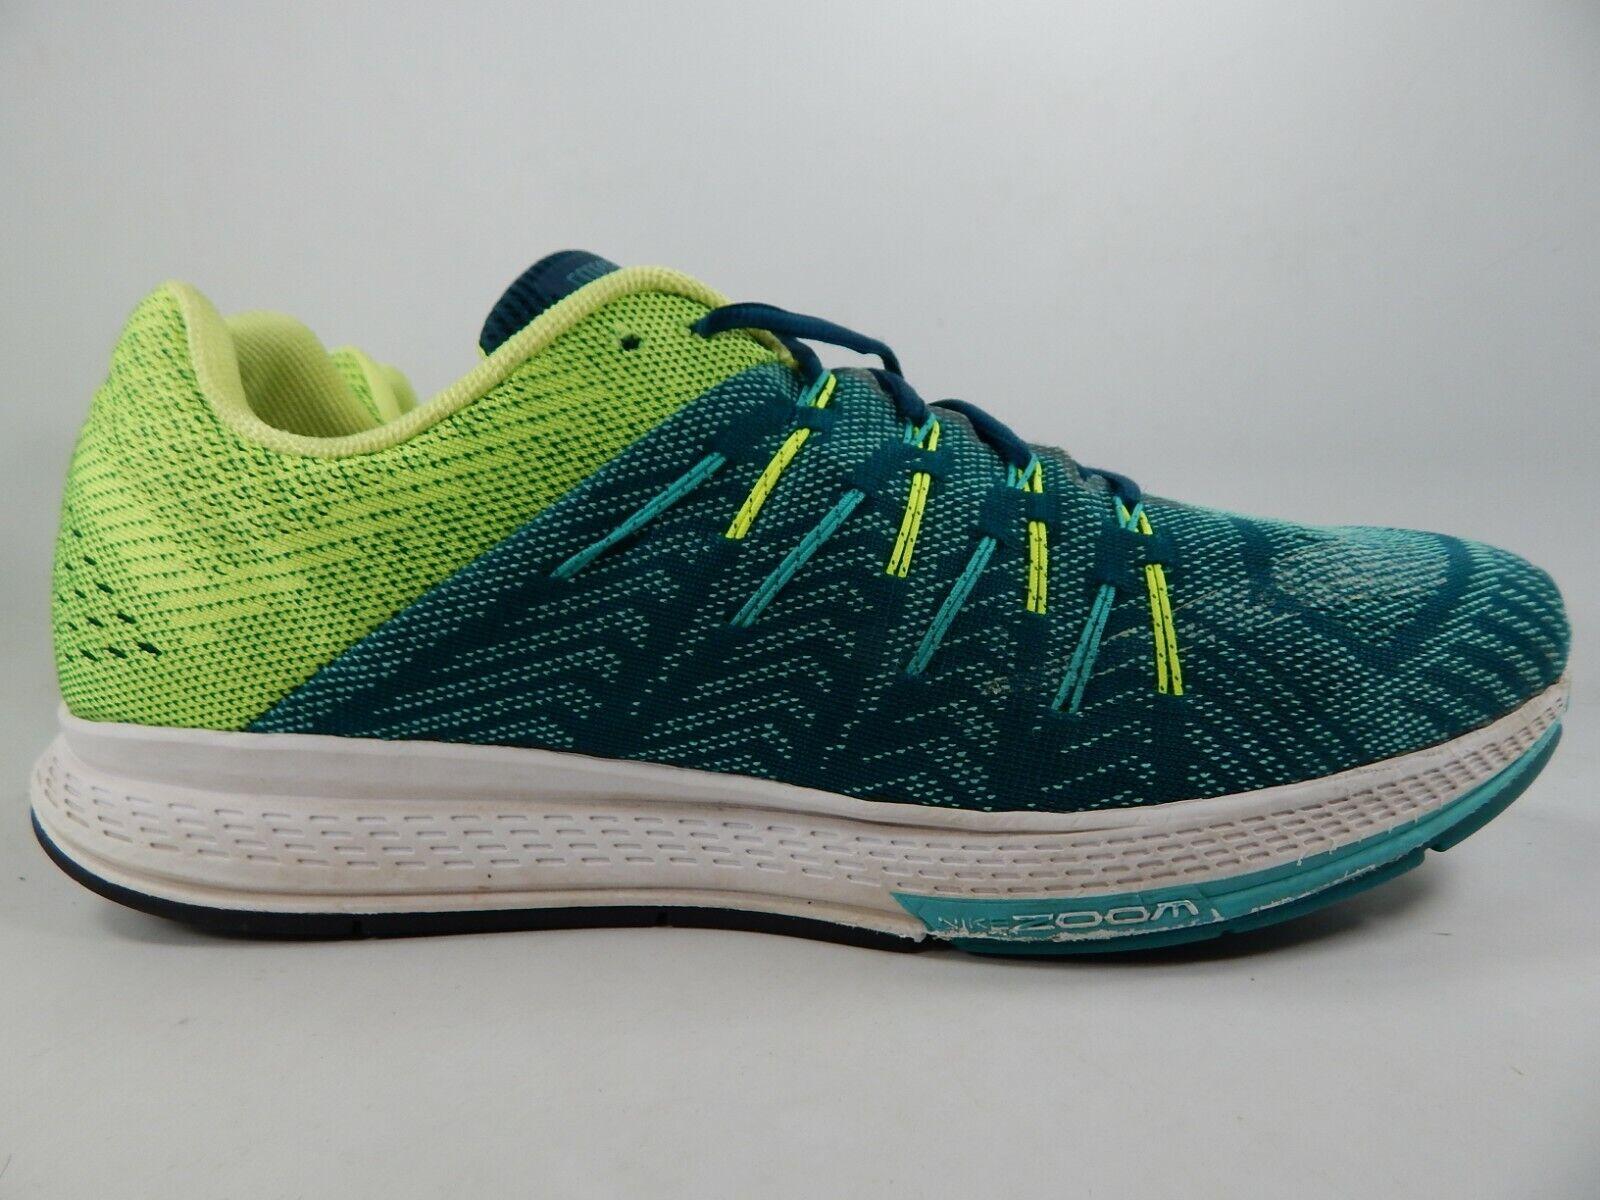 Nike Air Zoom Elite 8 Size US 14 M (D) EU 48.5 Men's Running shoes 748588-301